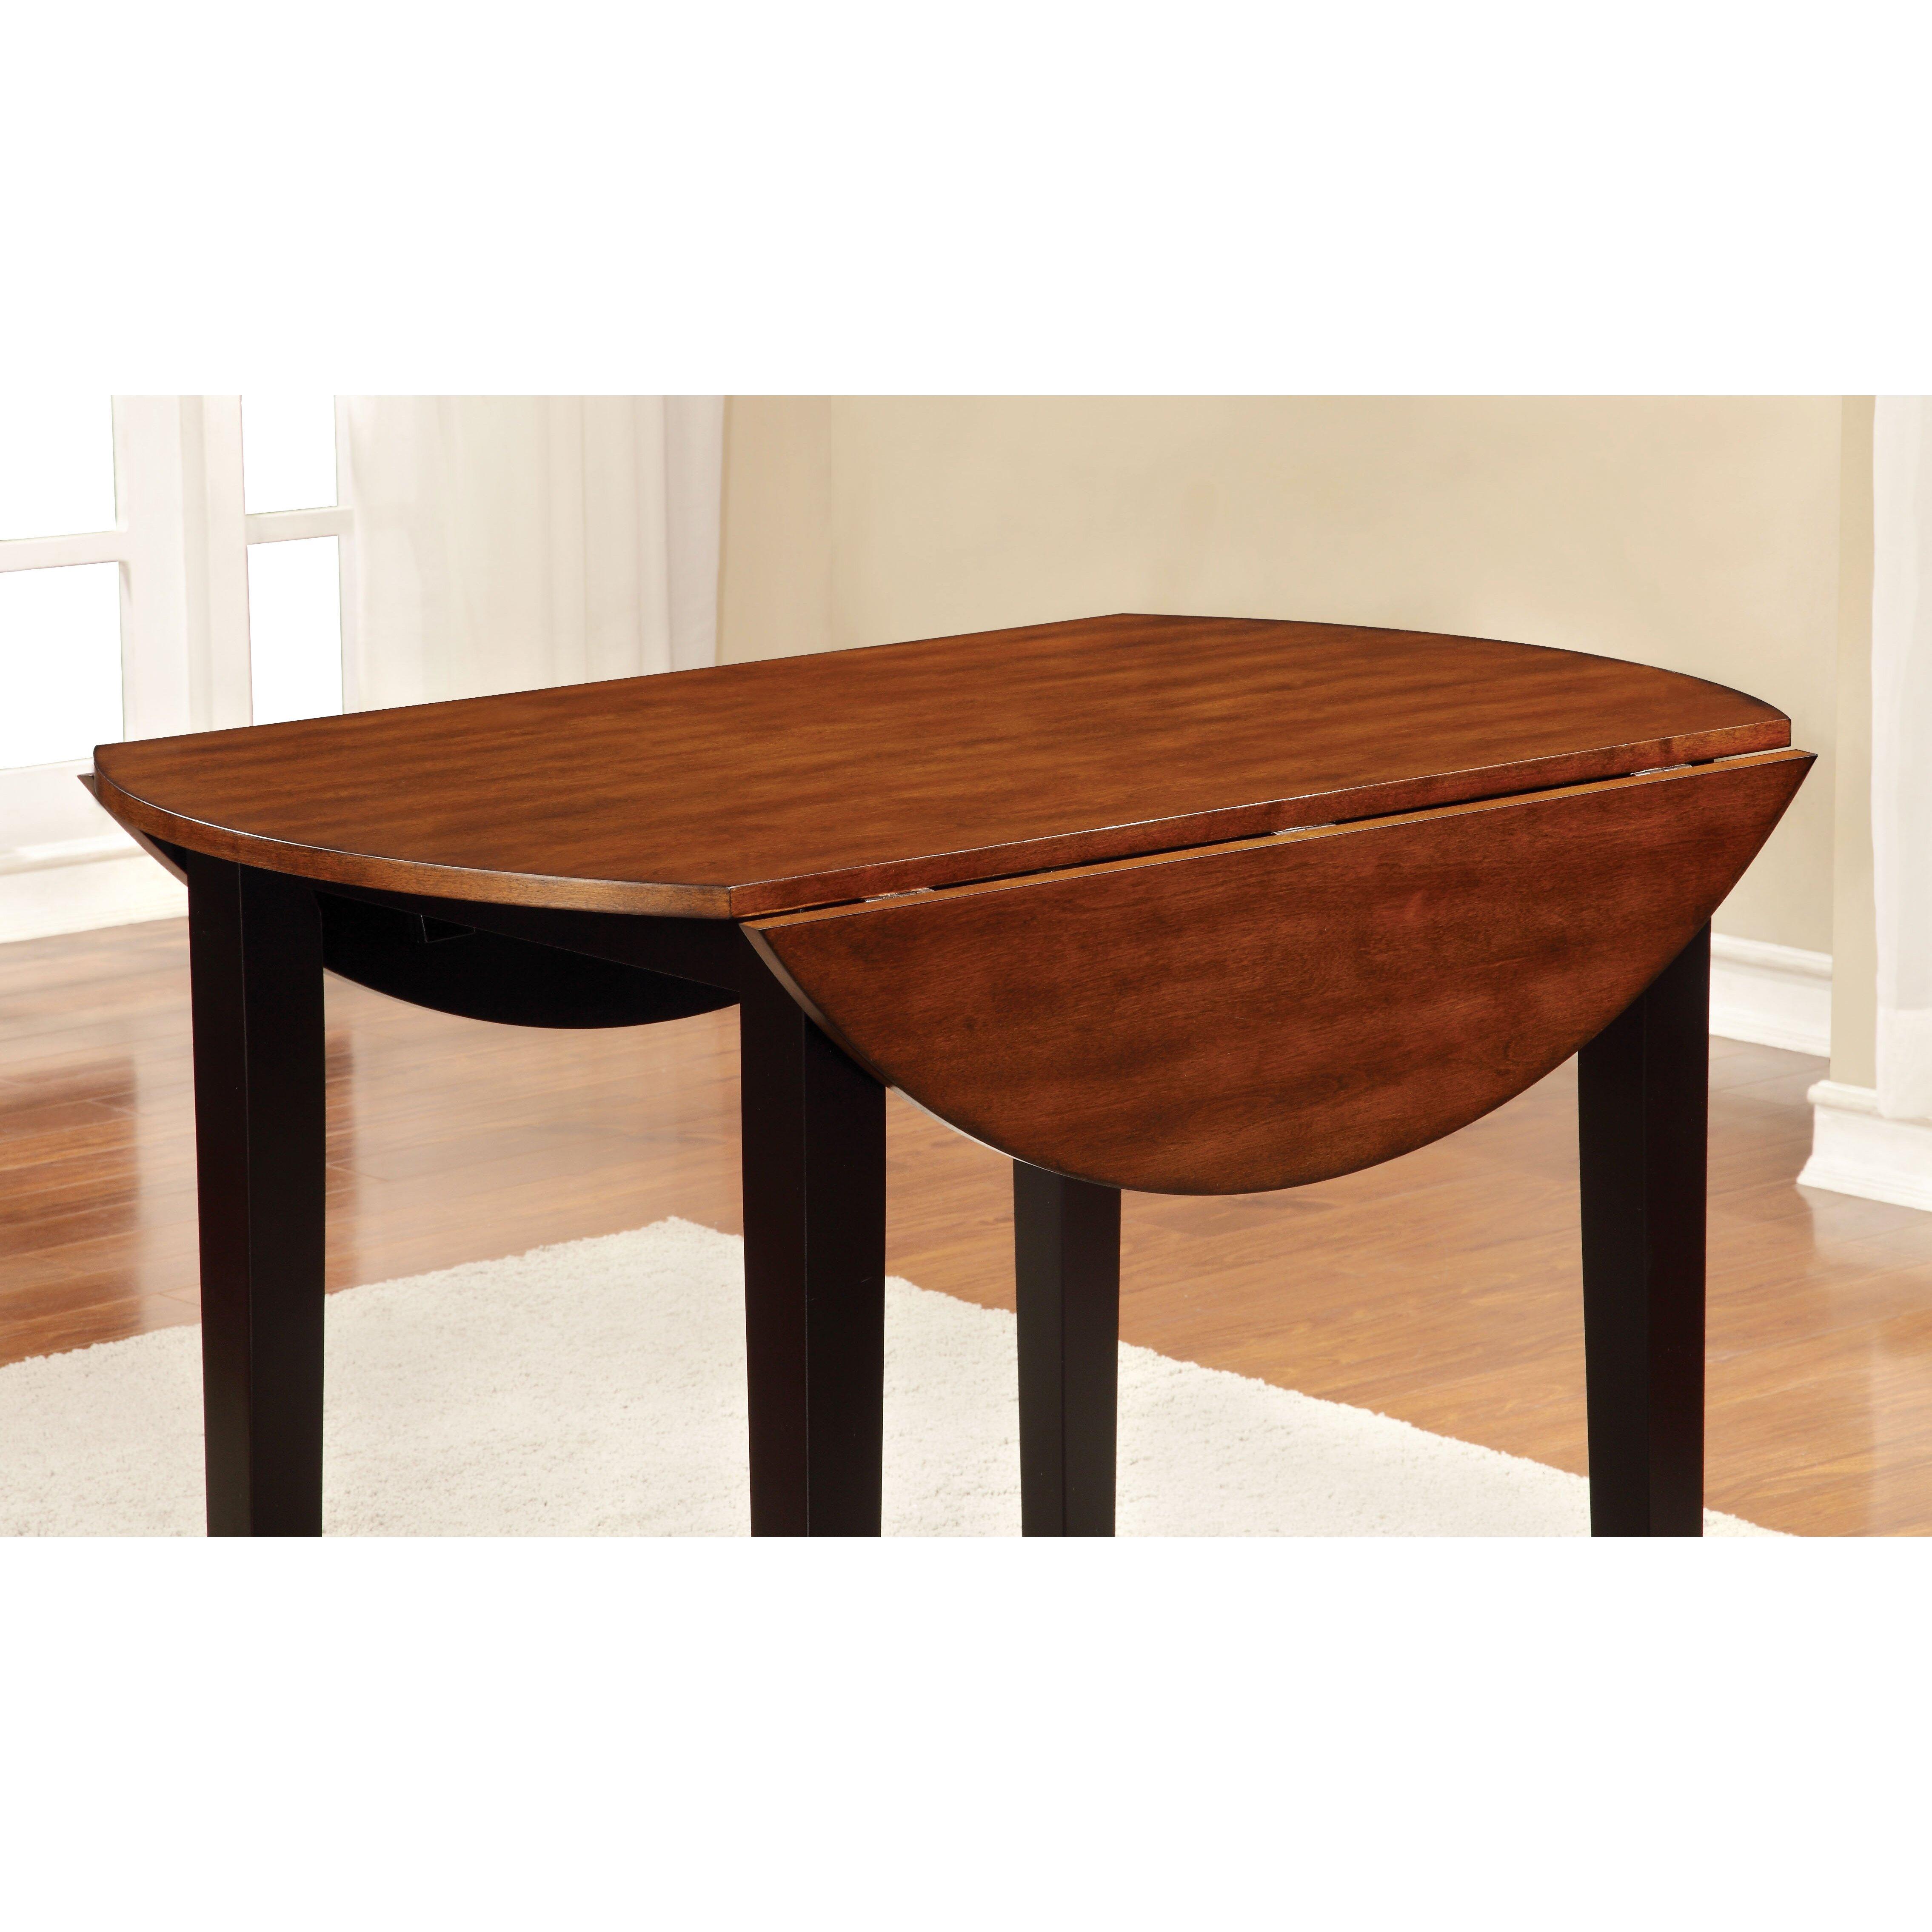 Hokku Designs Althea Dining Table Wayfair : Hokku Designs Althea Dining Table from www.wayfair.com size 4541 x 4541 jpeg 1597kB